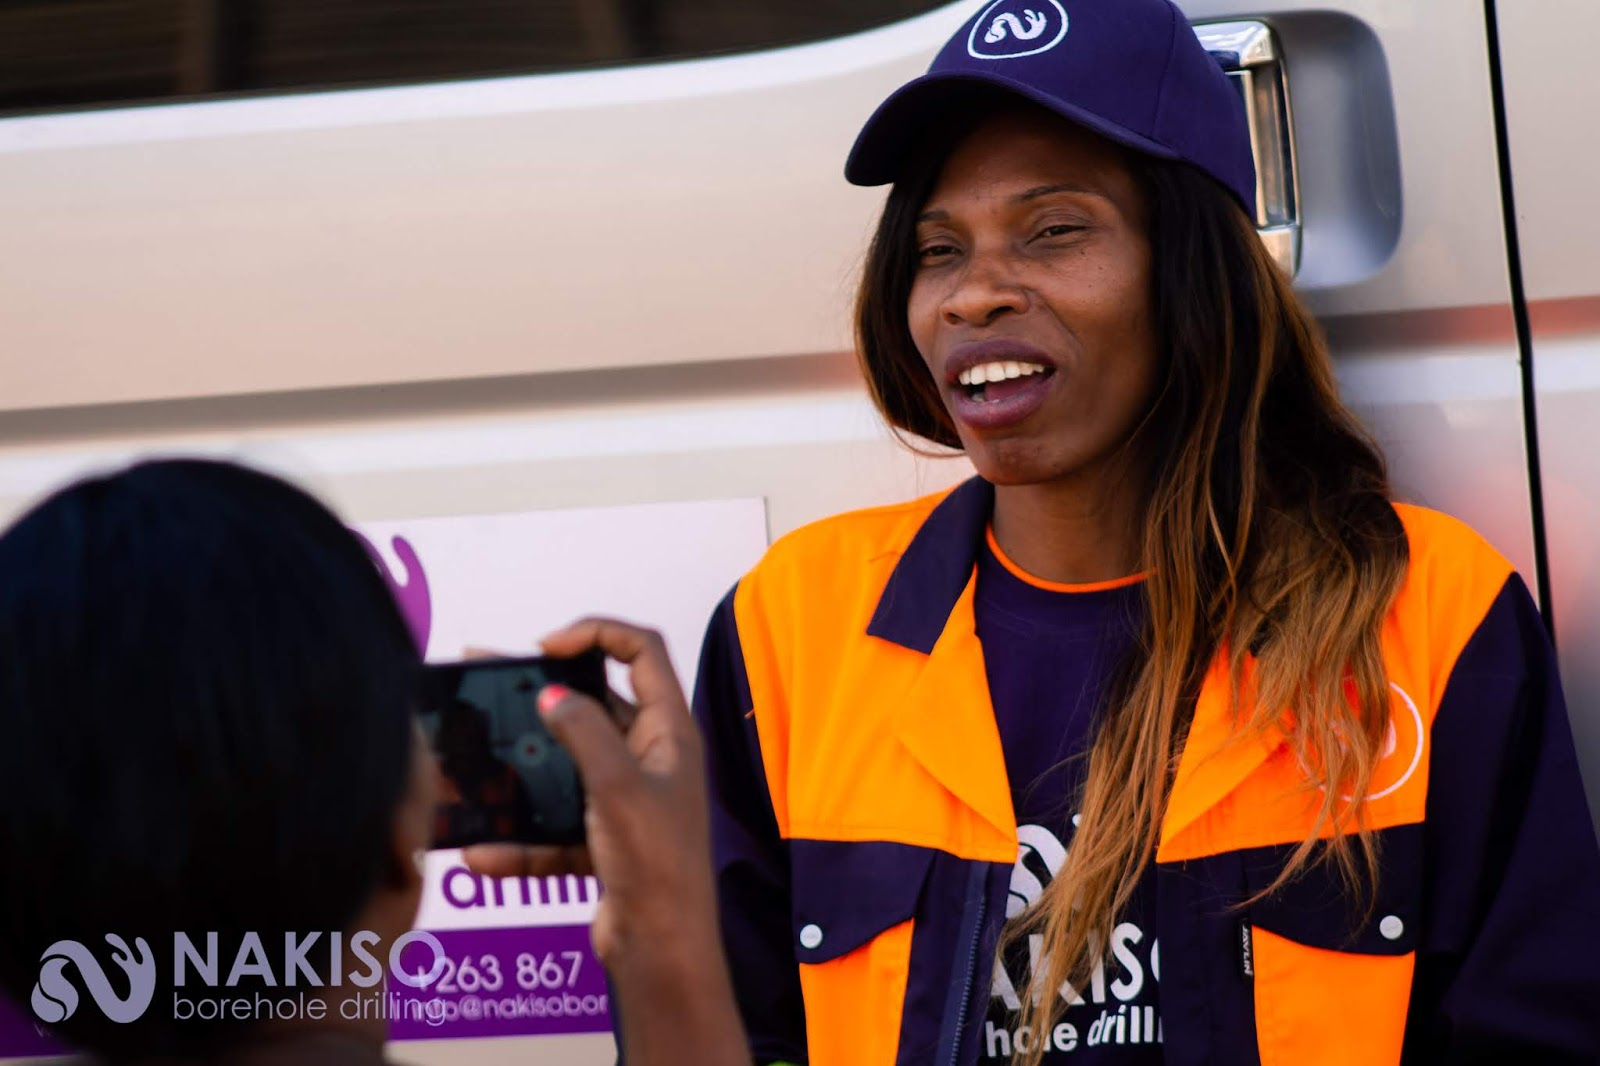 Nakiso Borehole Drilling Rescue Women!